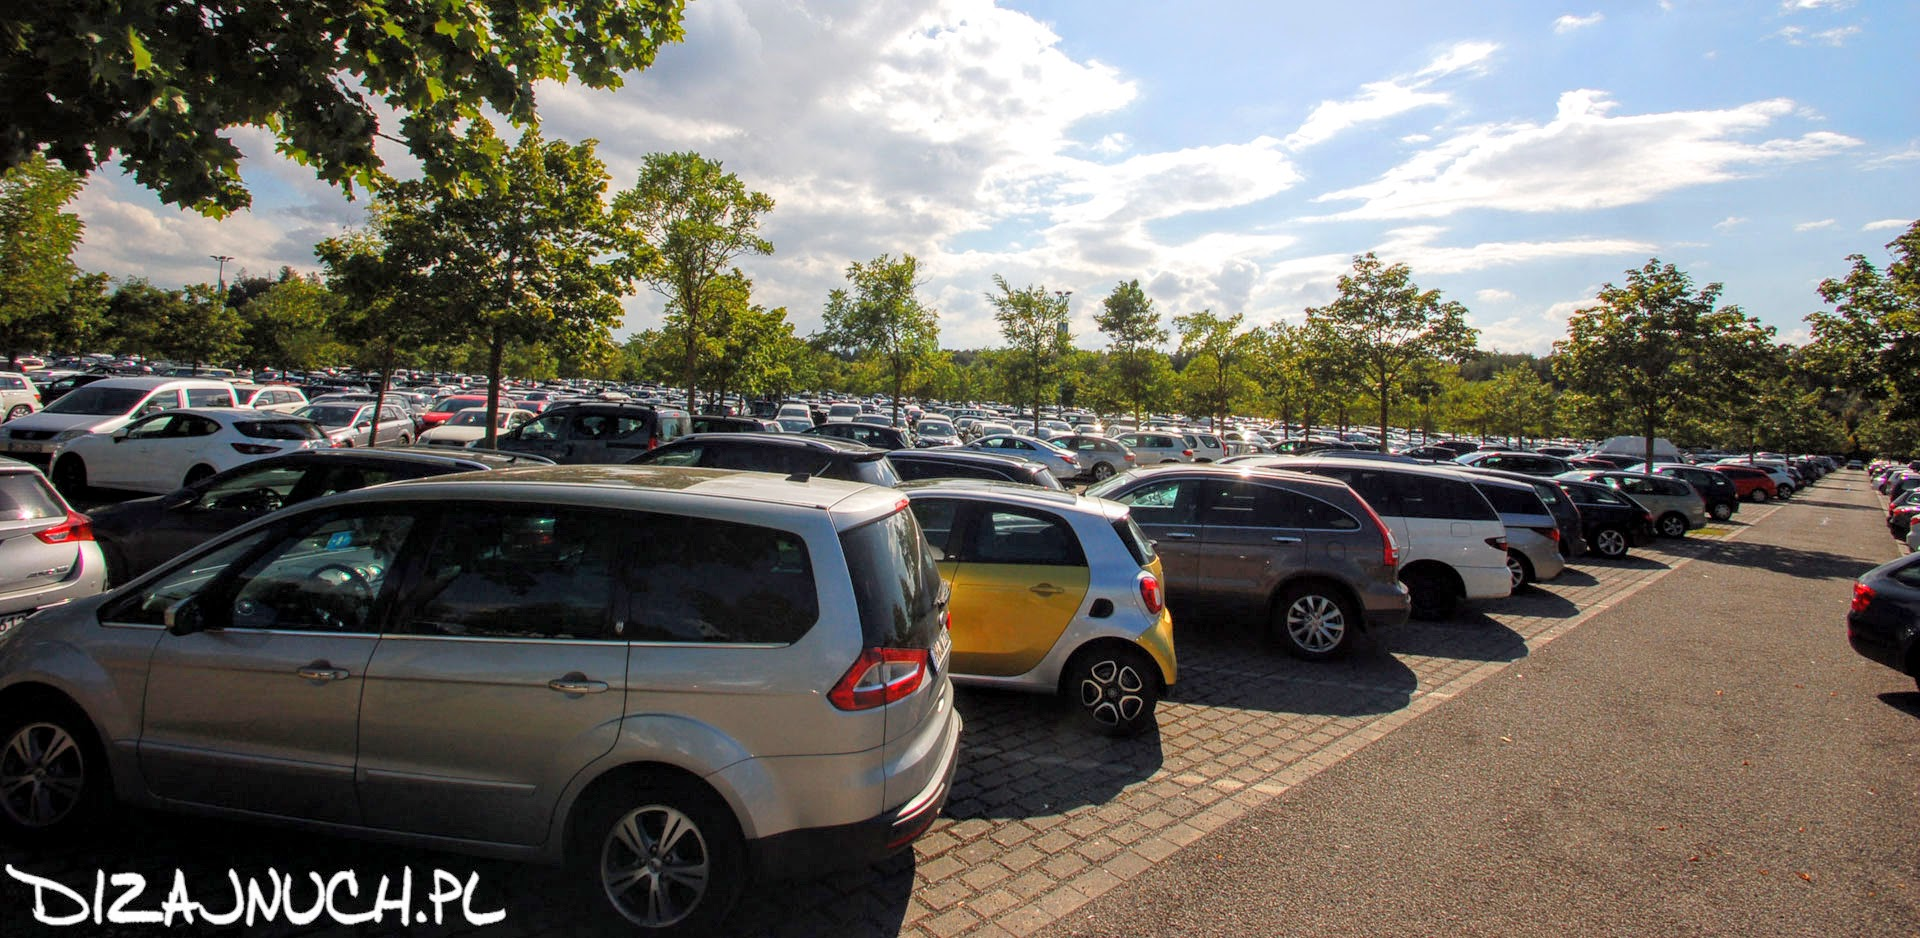 legoland parking